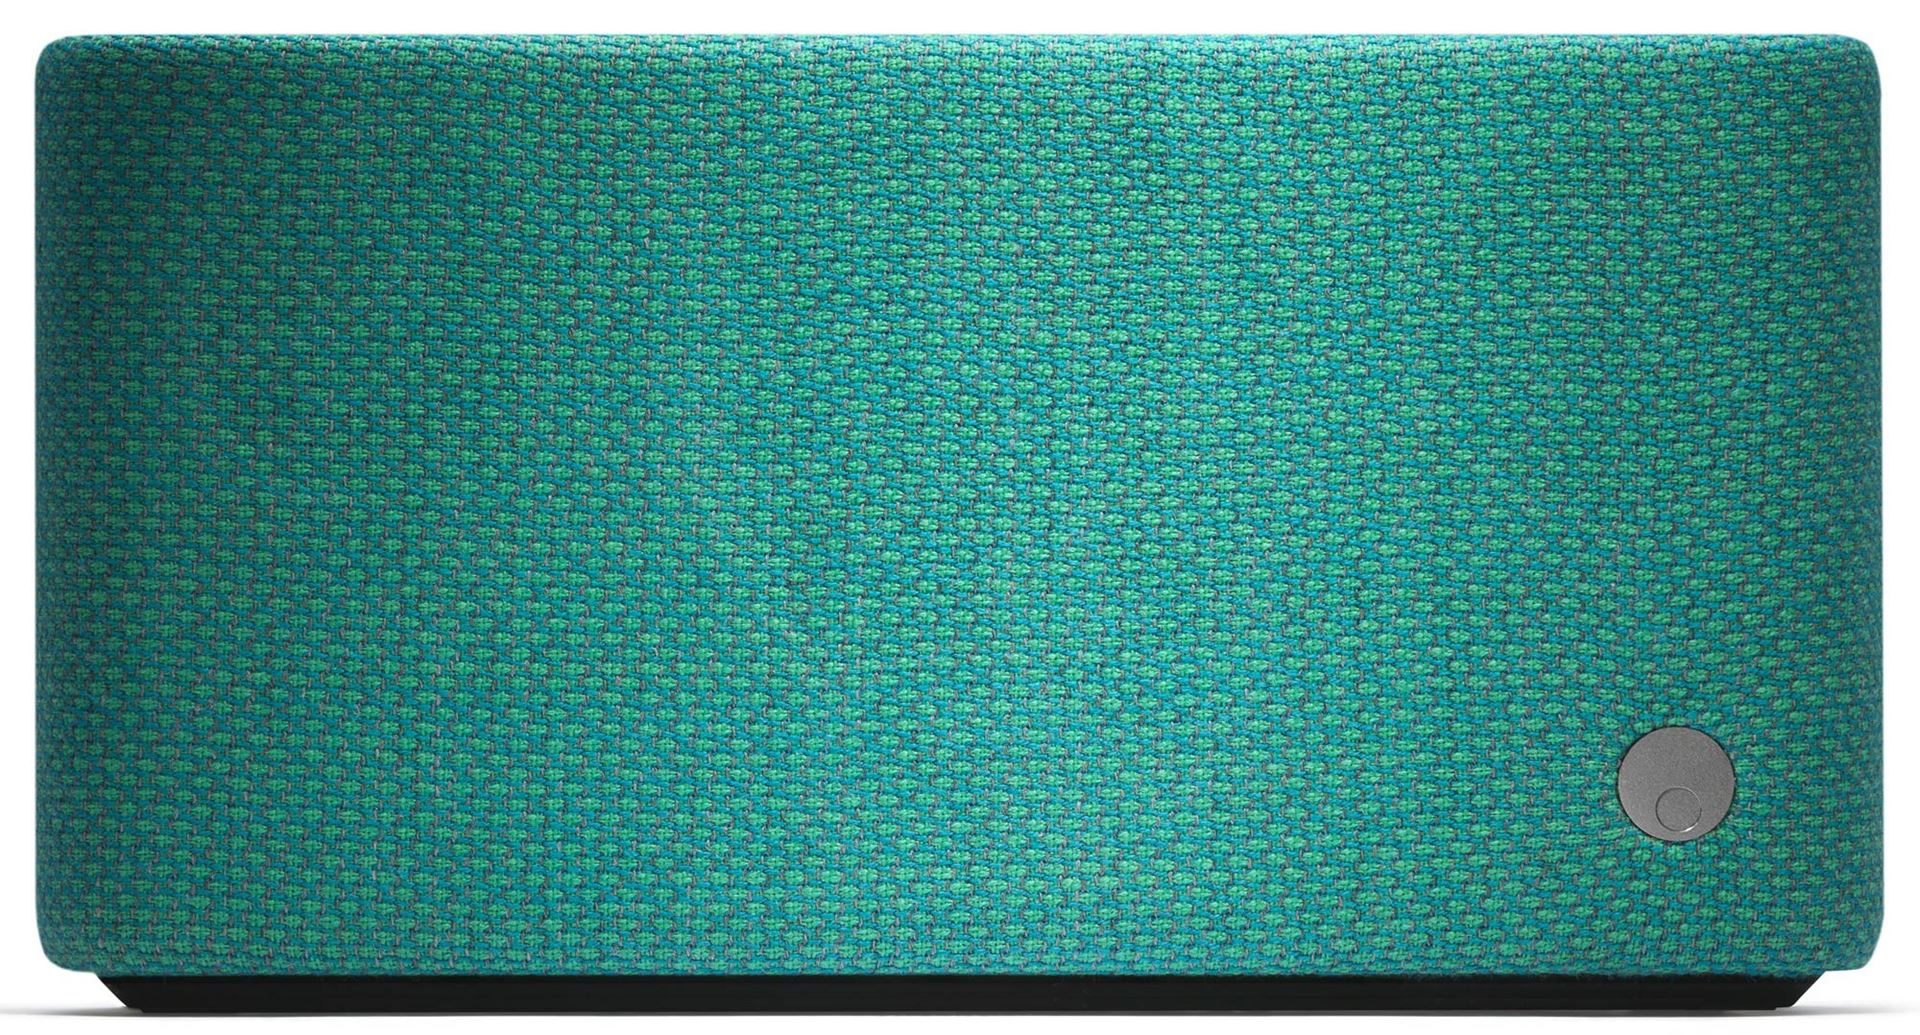 audiow3 enceinte bluetooth portable cambridge audio yoyo s. Black Bedroom Furniture Sets. Home Design Ideas